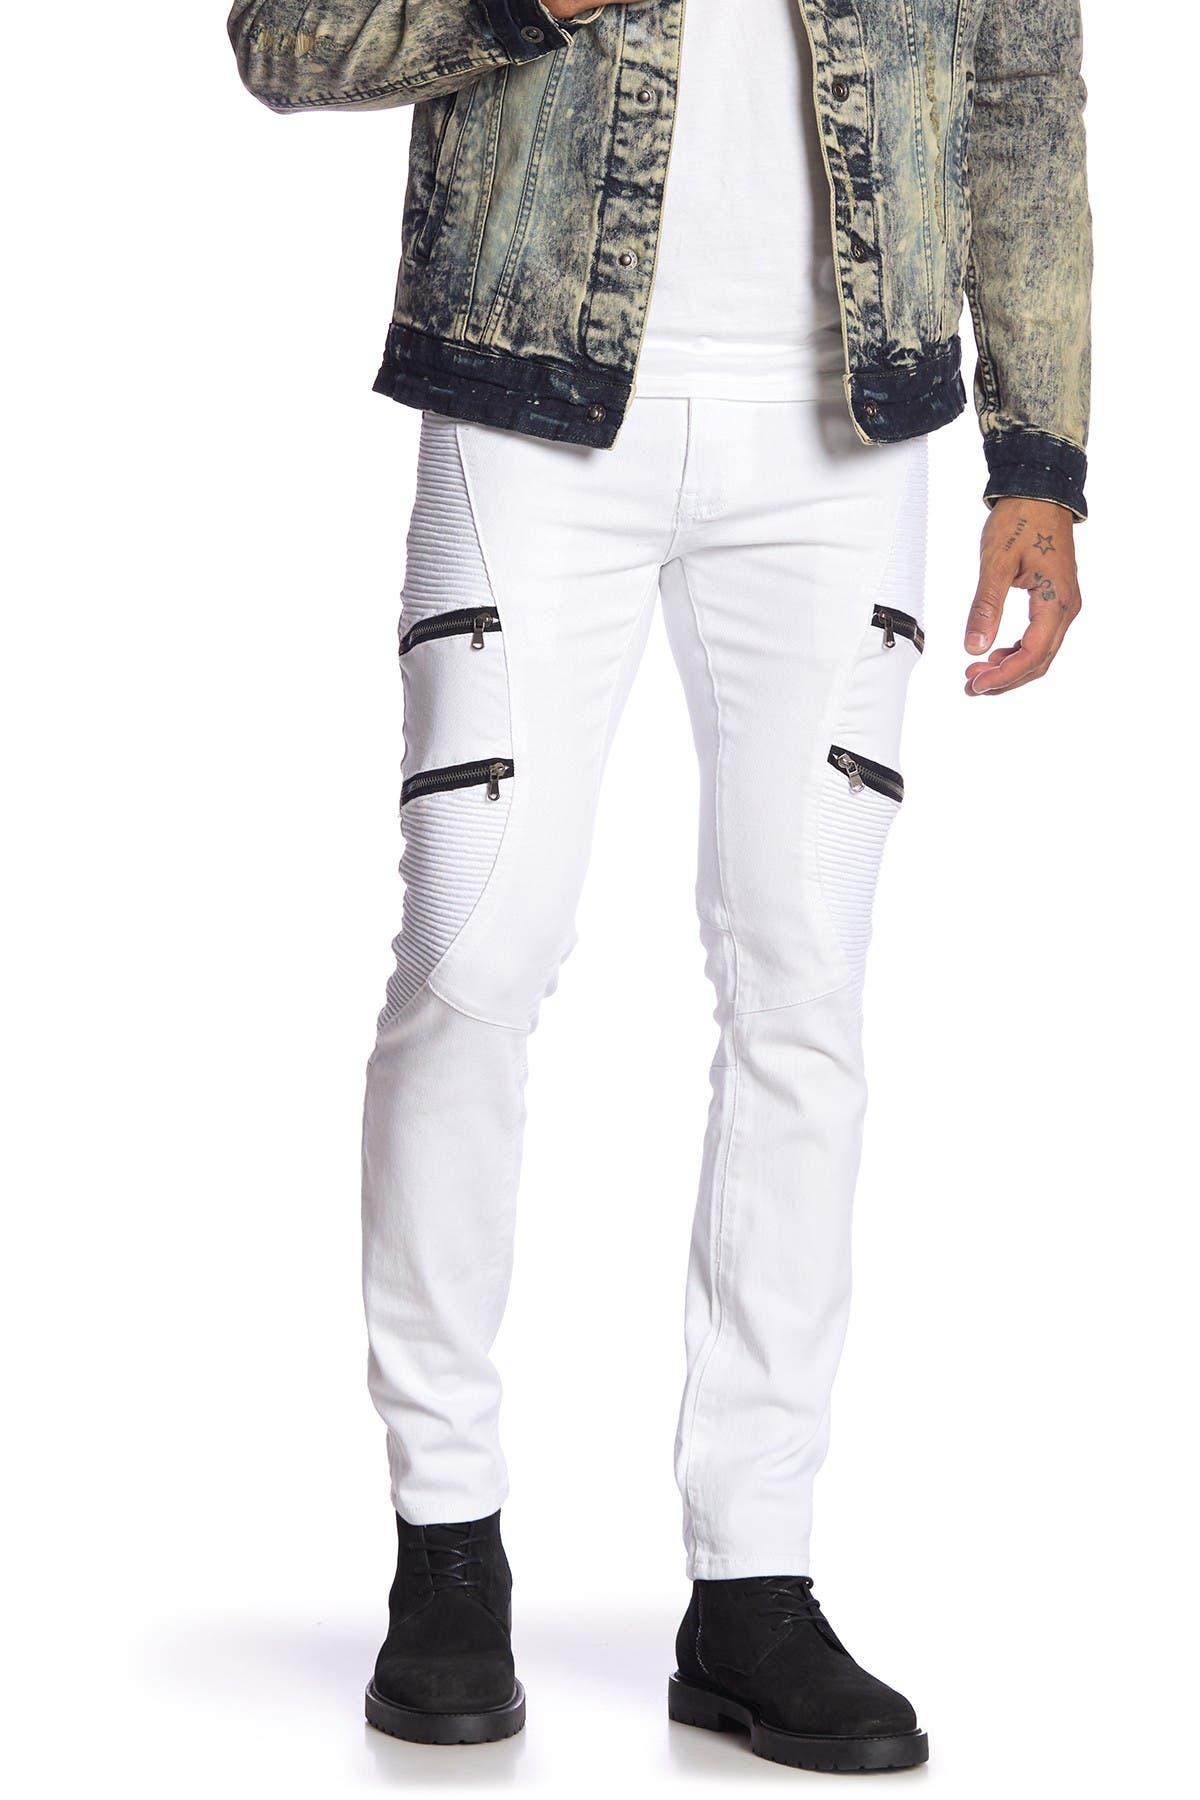 "Image of XRAY Multi Texture Zip Detail Jeans - 30-32"" Inseam"